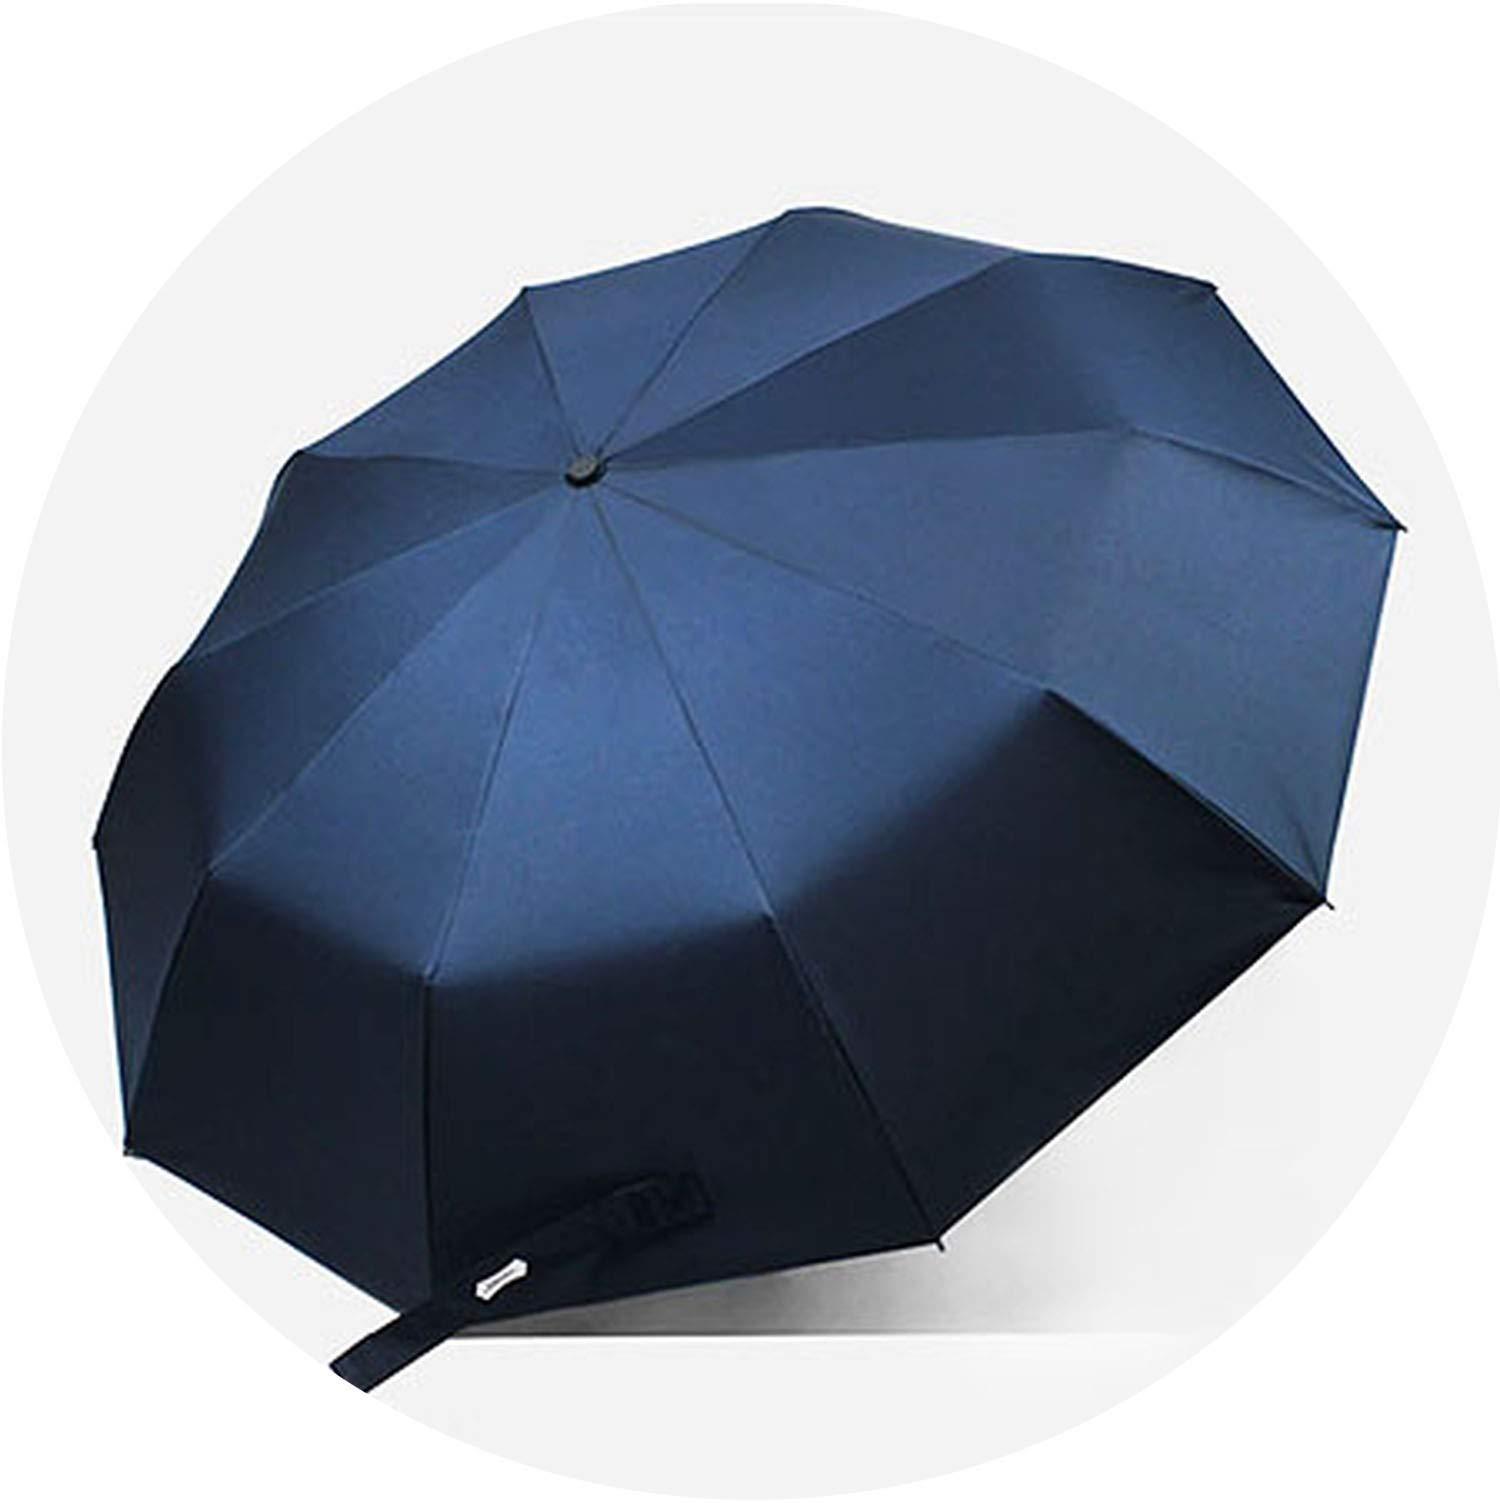 Strong Windproof Rain Umbrellas Anti UV Automatic Folding Umbrella Men Women 10K Sun Protection Wooden Handle Paraguas,Navy